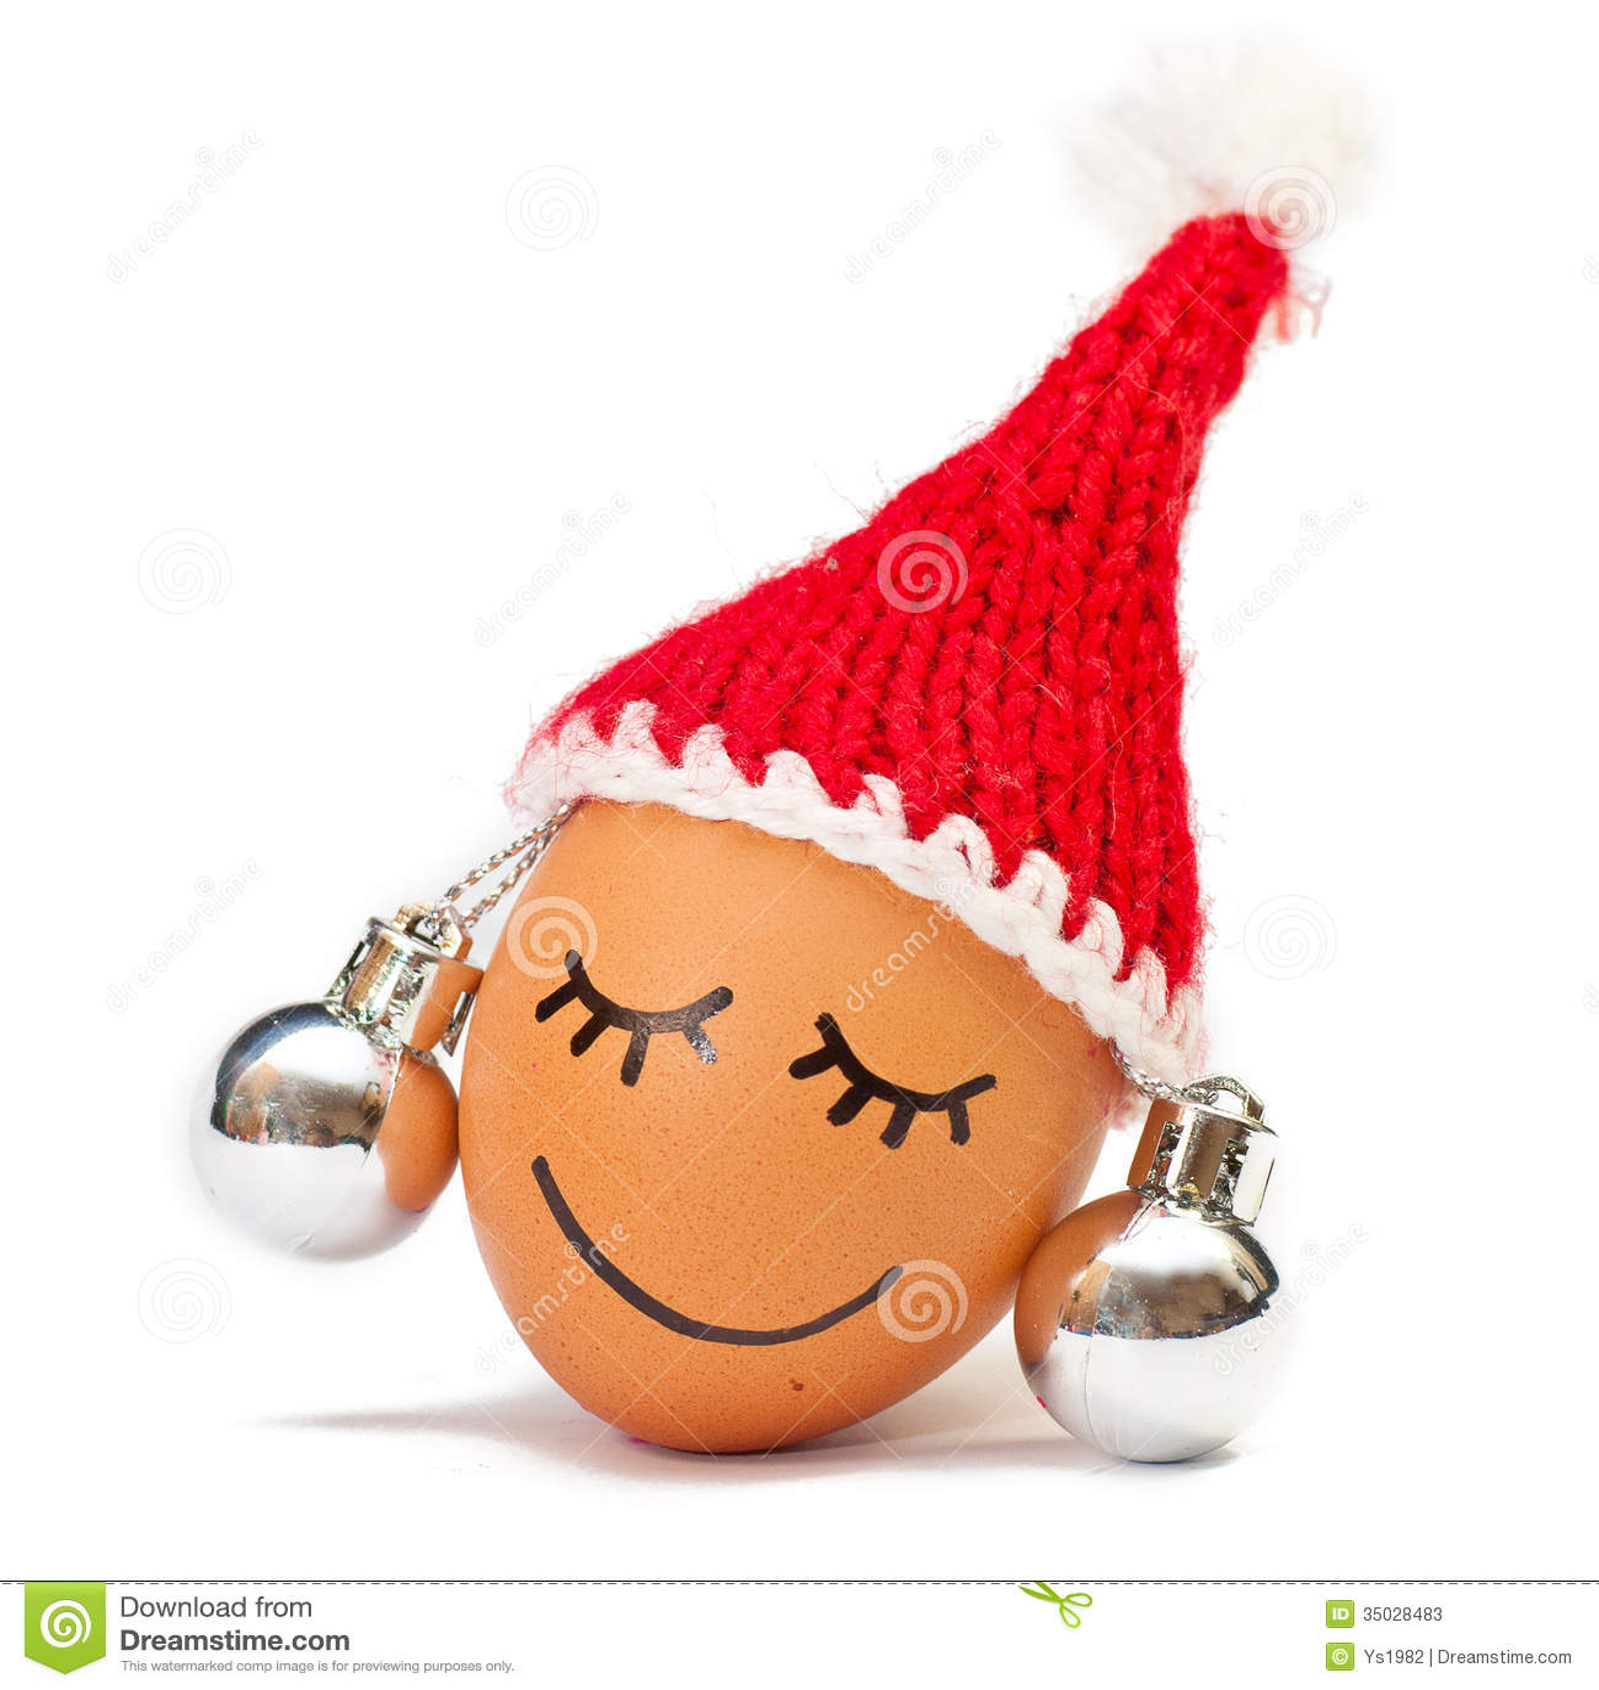 5c25ea87b21d1 Funny Lovely Egg In Winter Santa Hat And Ball Lika A Earring Stock ...